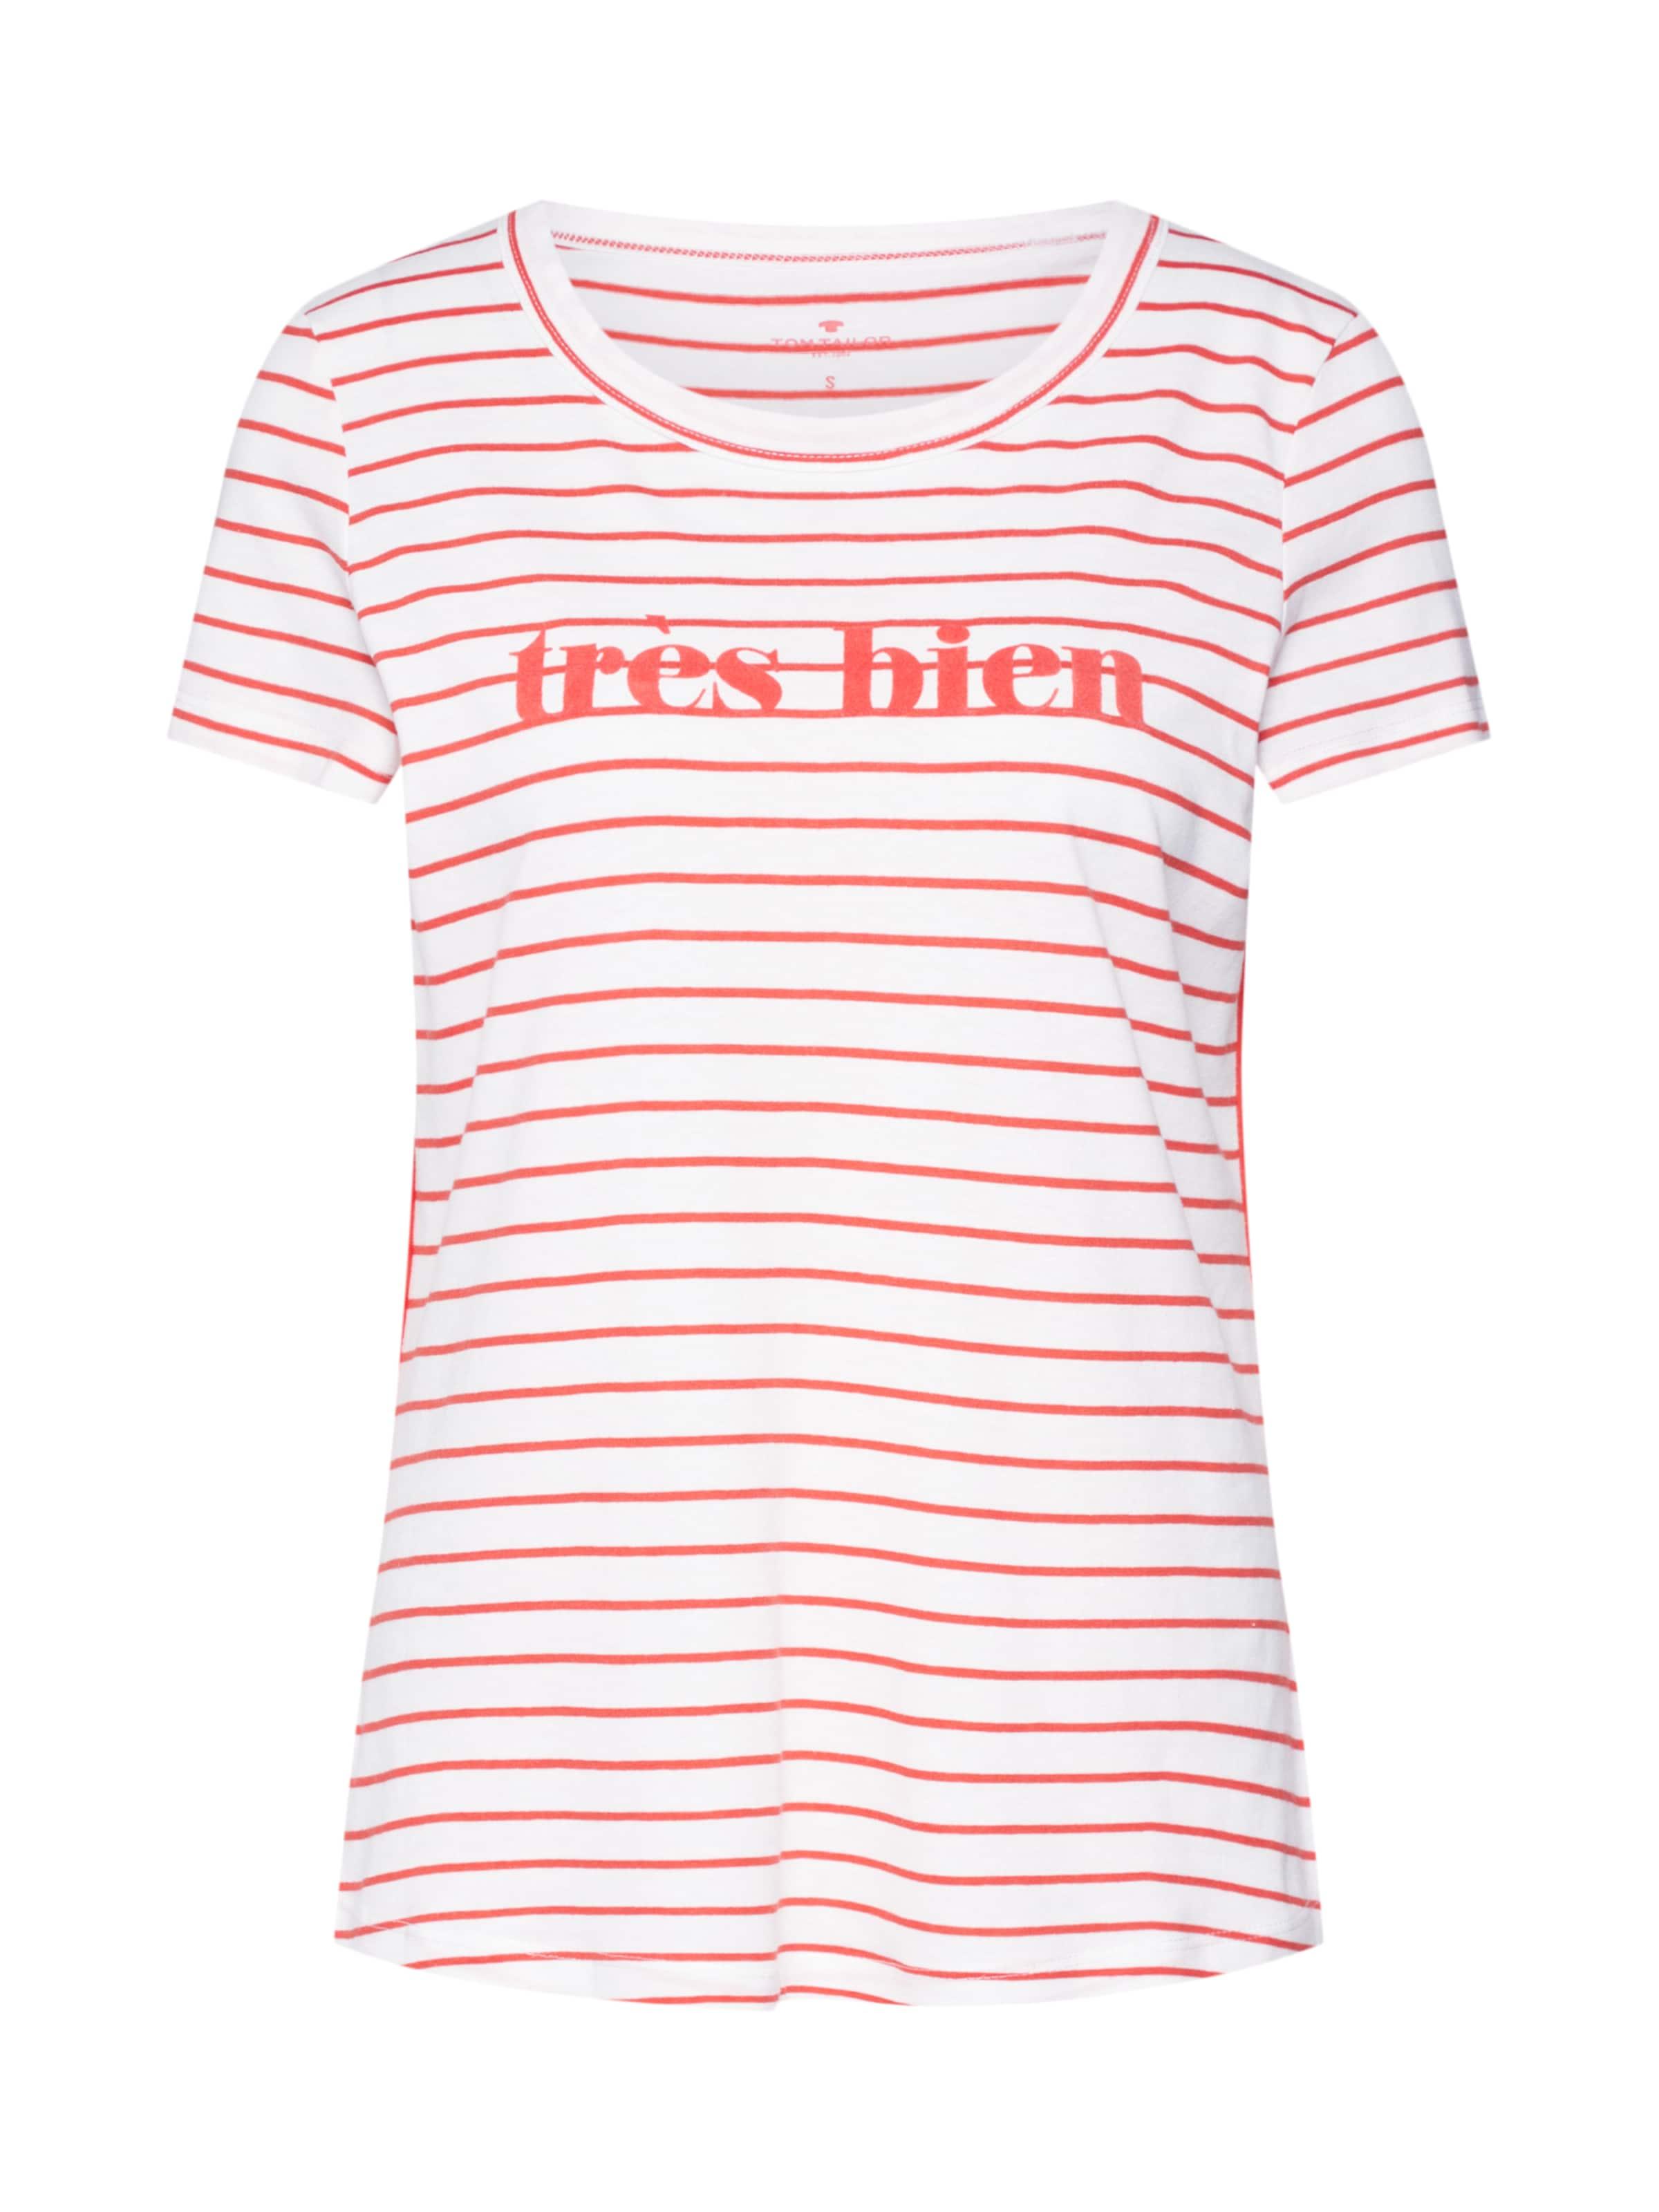 T OrangeWeiß shirt Tom Tailor In O8kXNwPZn0